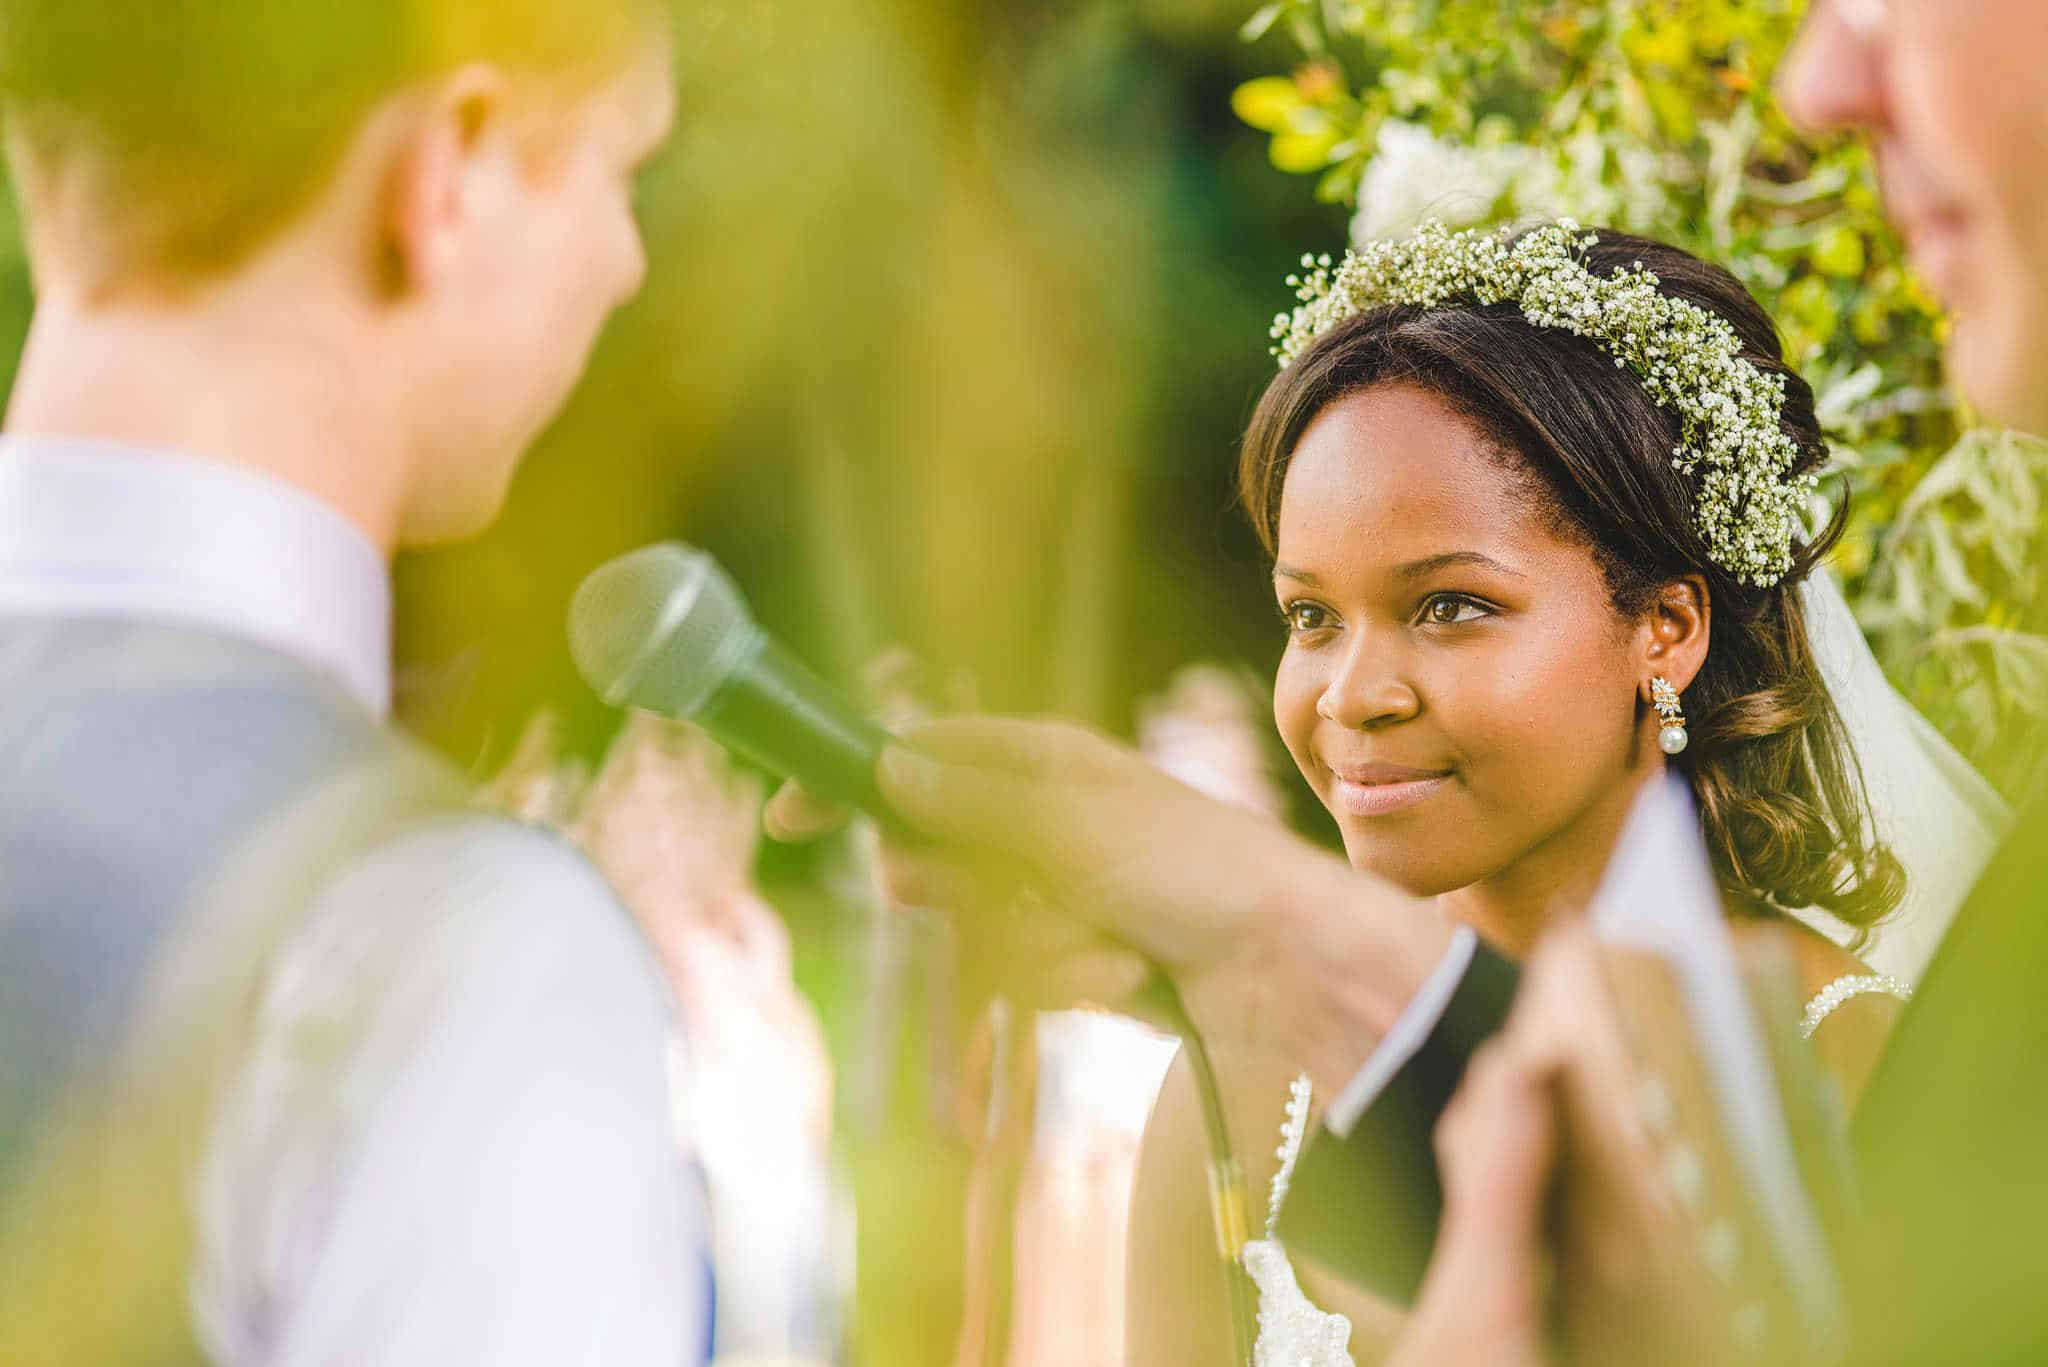 wedding photography midlands 68 - Midlands wedding photography - 2015 Review